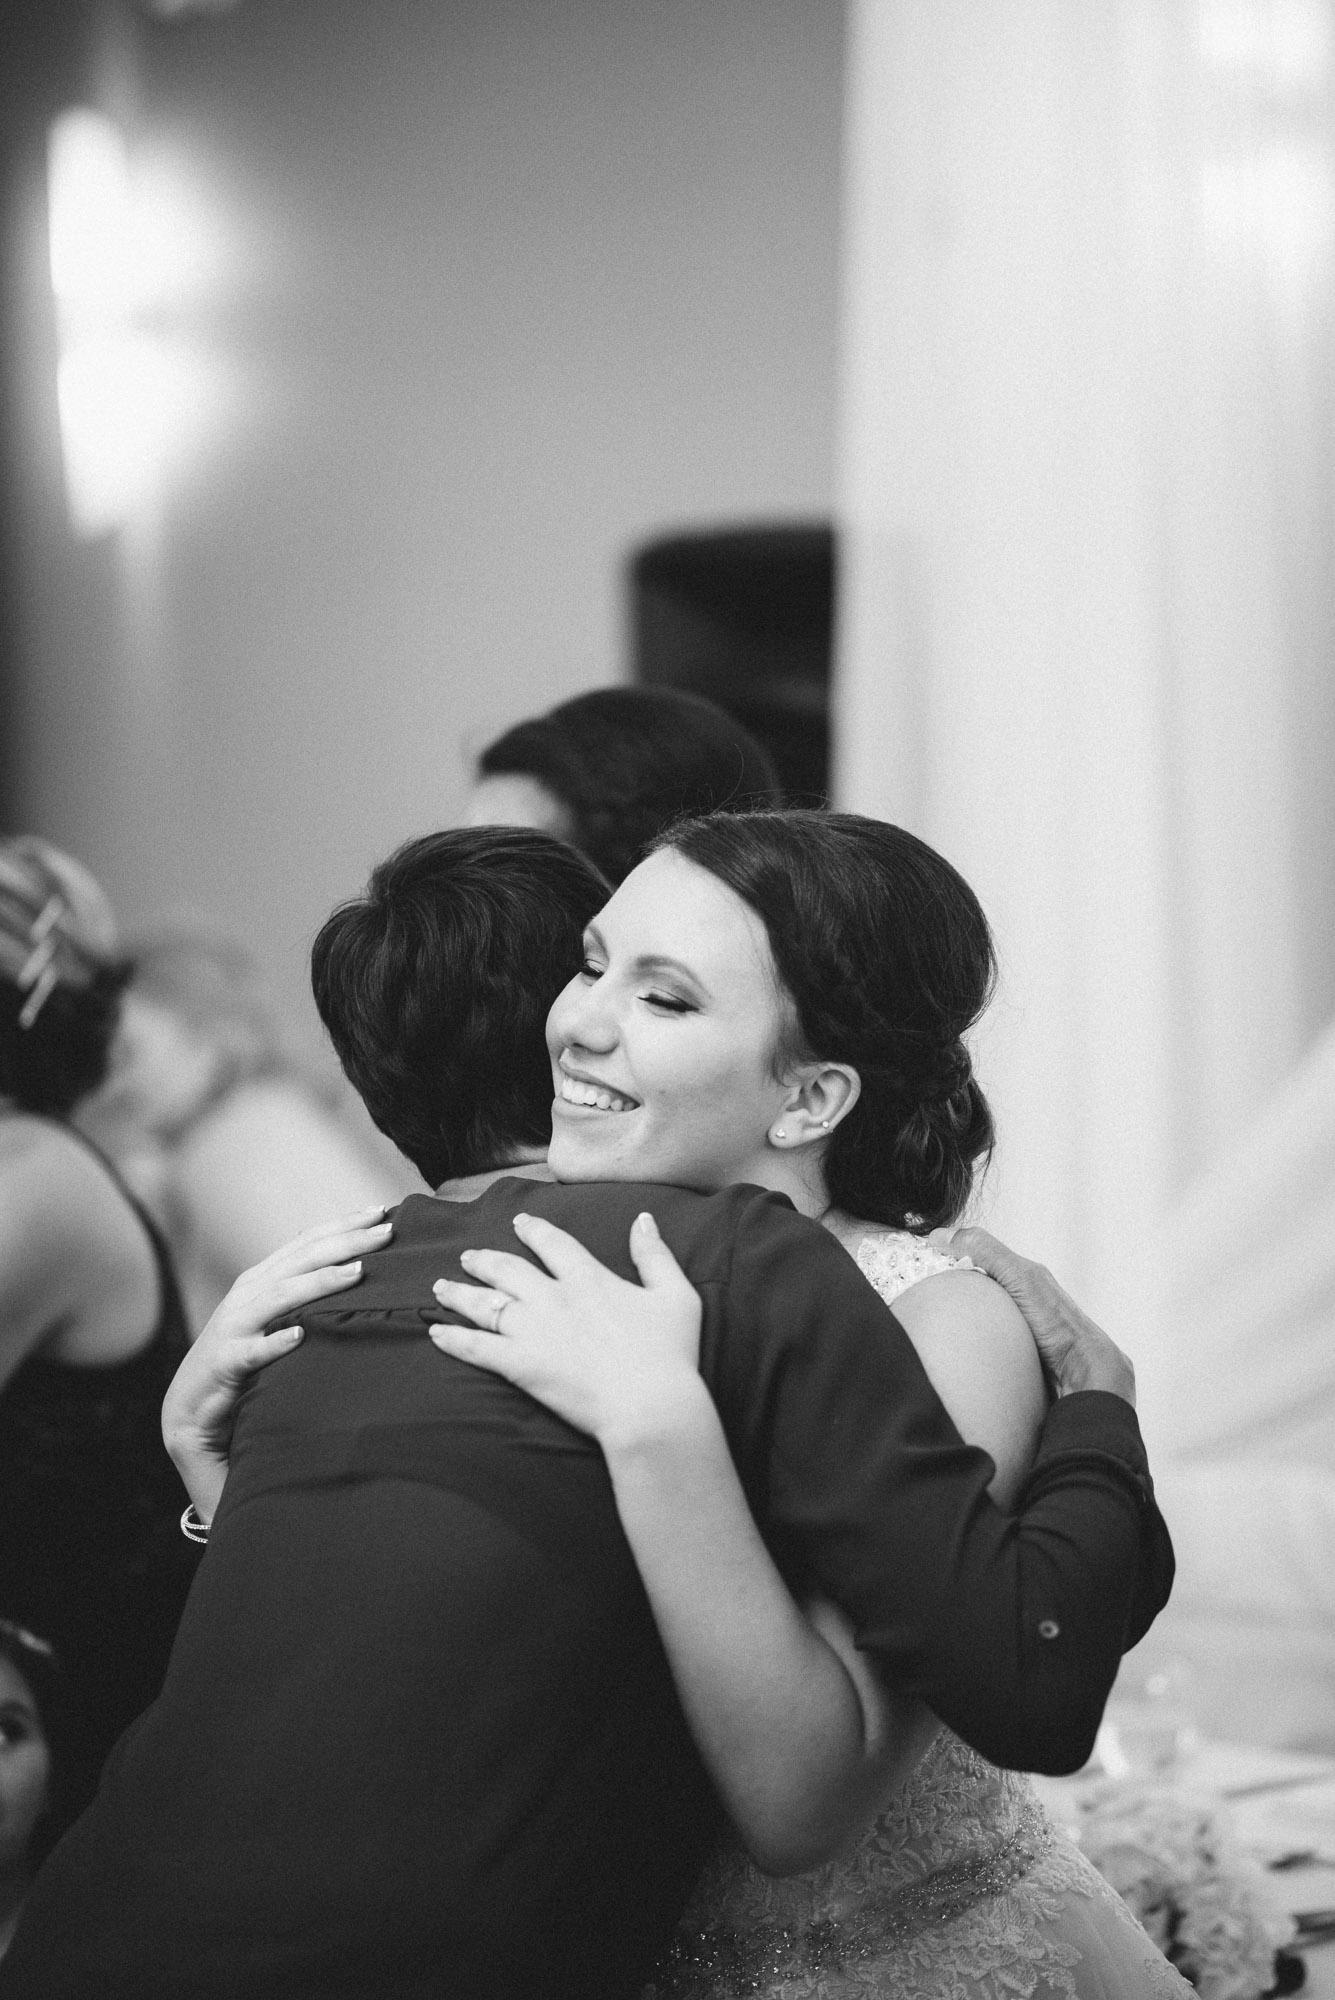 Bride hugs guest at receiving line